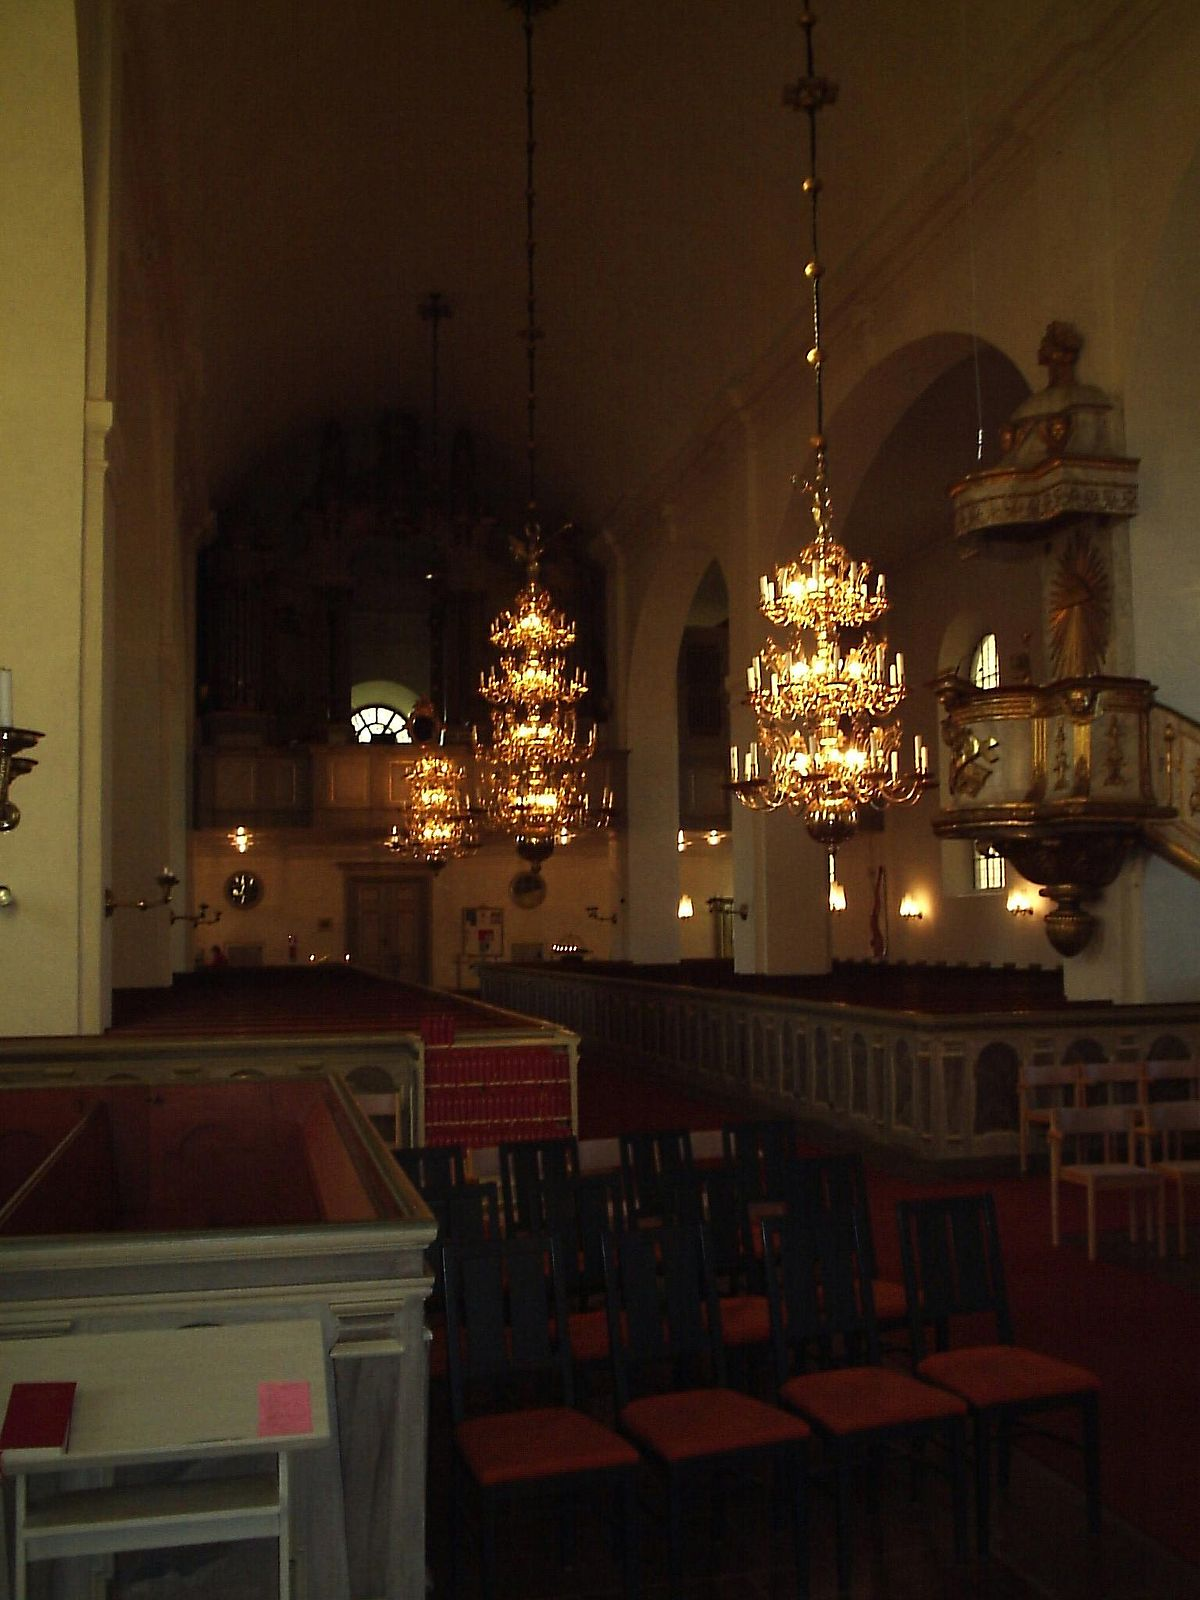 Fil:Sankt Olai kyrka i Norrkping, den stora gngen